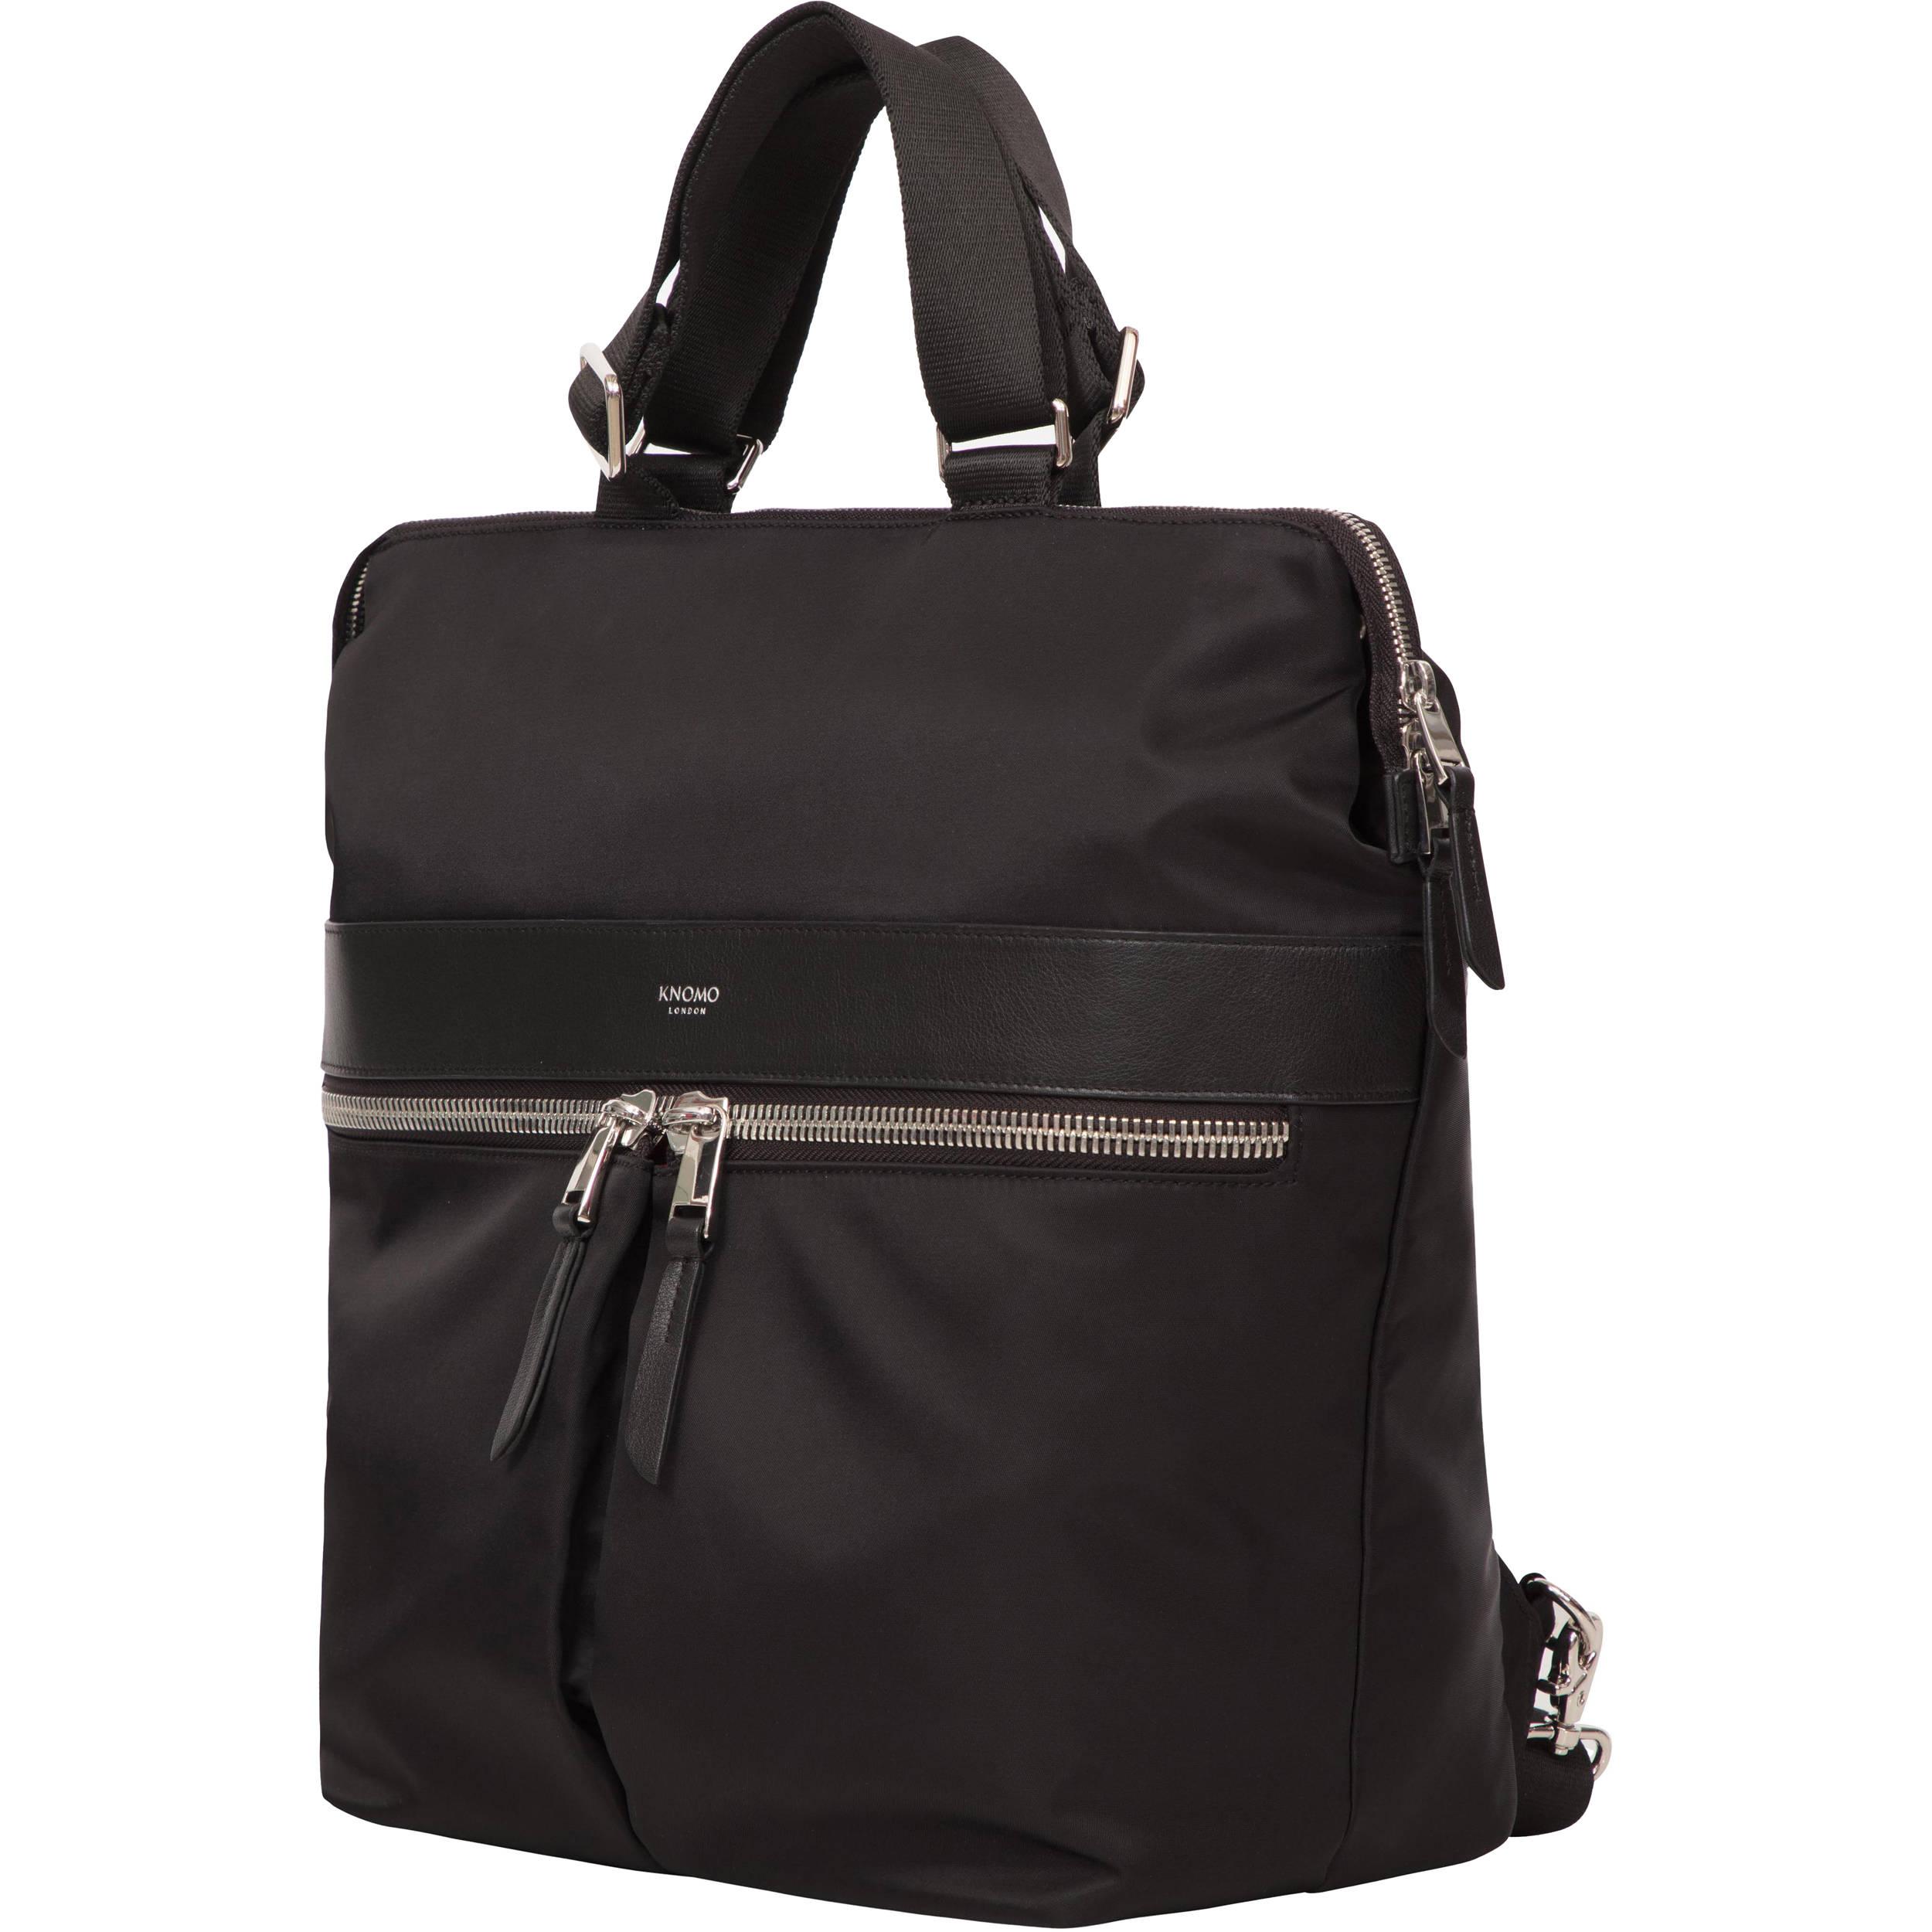 6e4a220b0b KNOMO USA Gilbert Laptop Tote Backpack 14